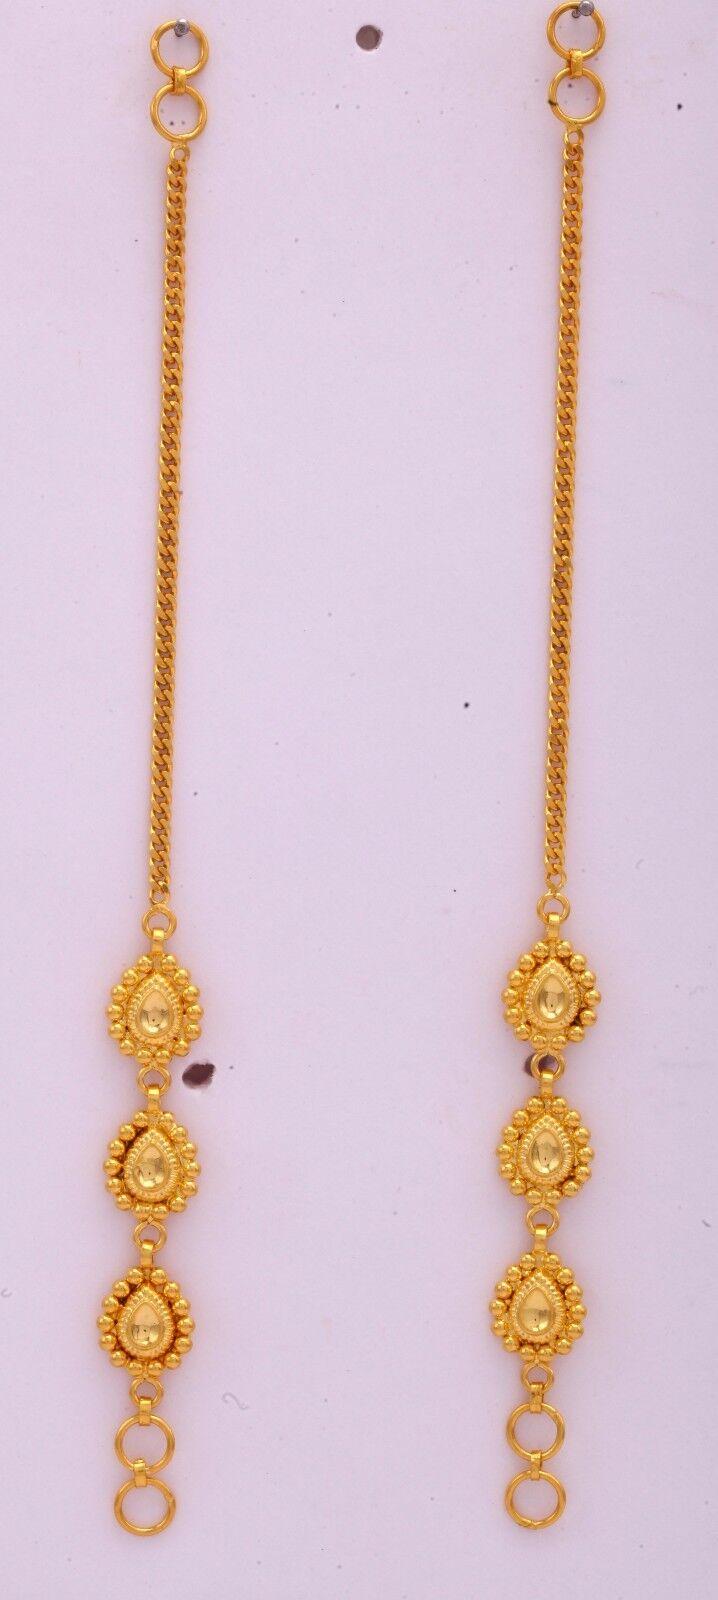 gold EAR CHAIN 22K gold EARRINGS CHAIN TO WEAR WITH EARRING  STUD WEDDING GIFT